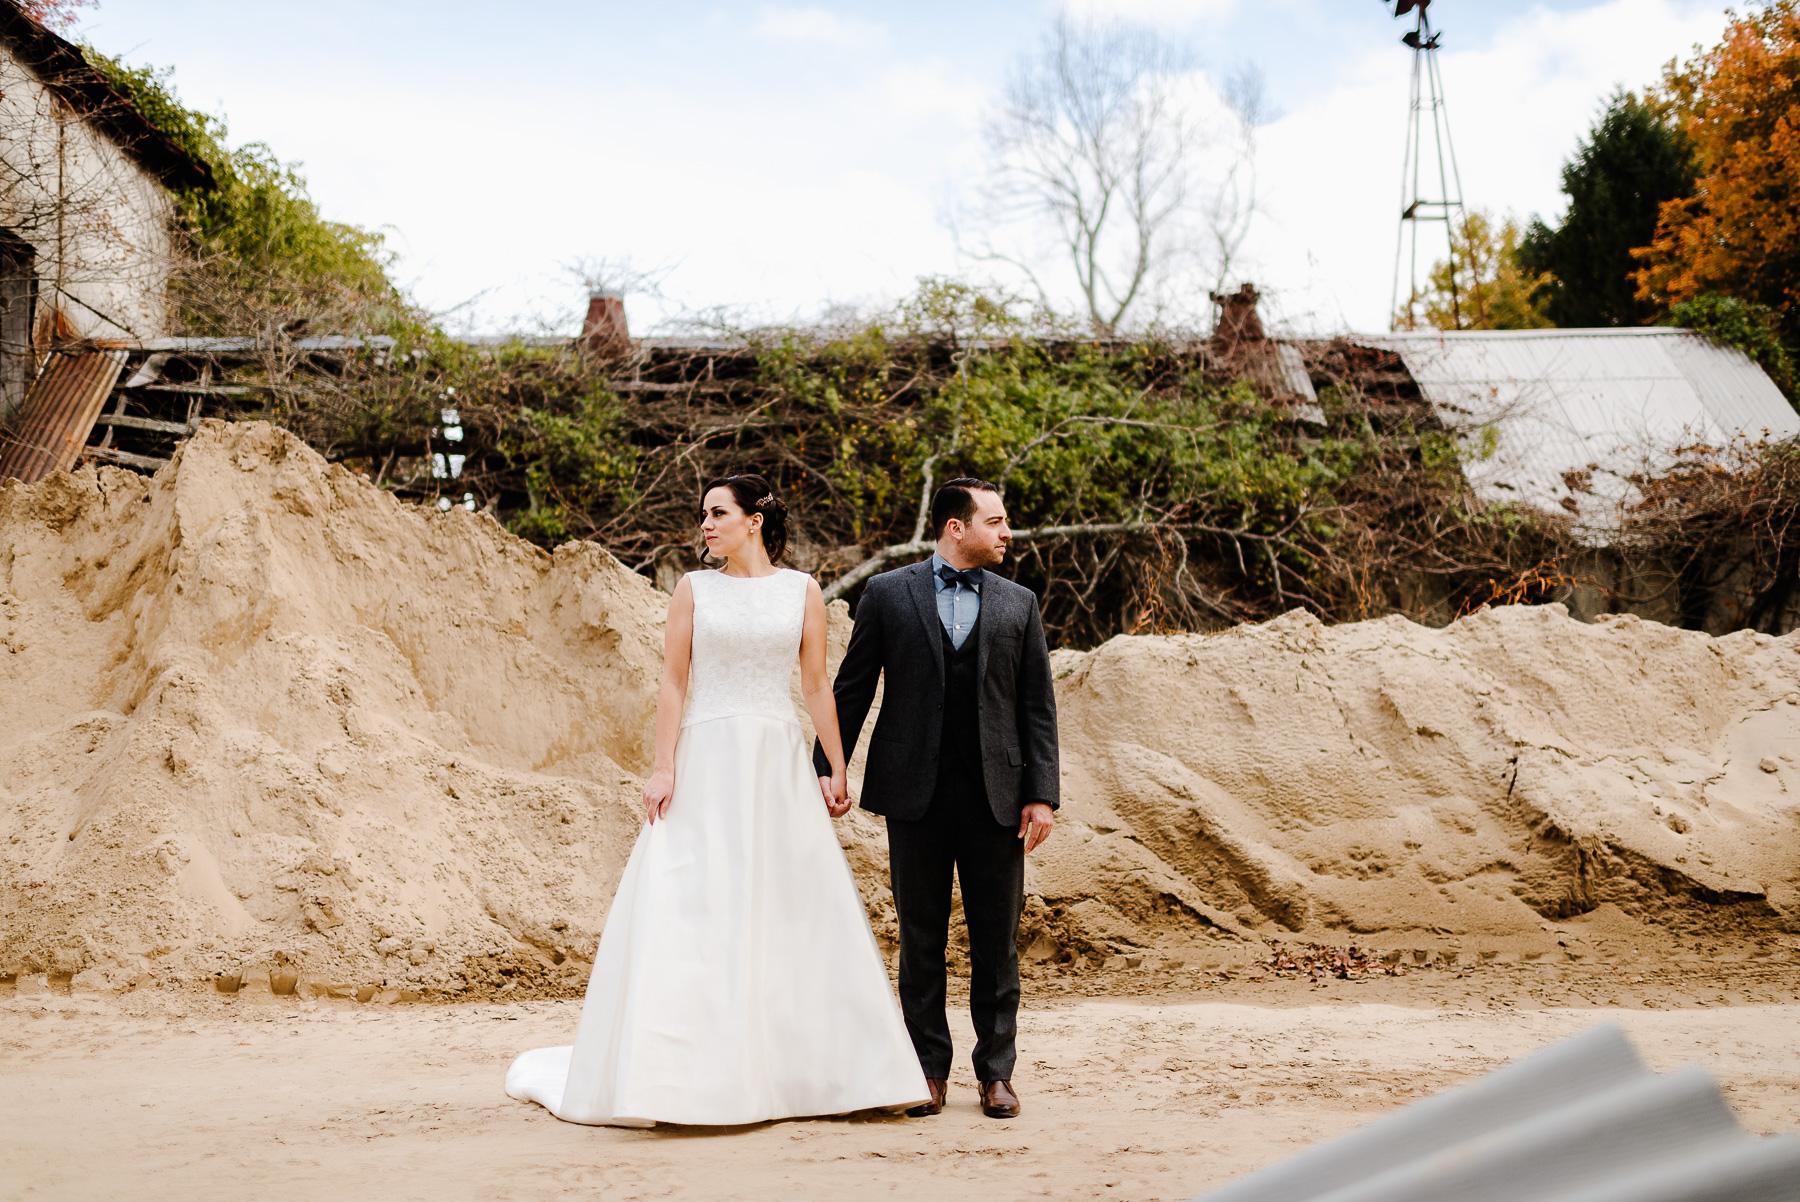 39-Laurita Winery Wedding New Jersey Wedding Photographer Laurita Winery Weddings Longbrook Photography.jpg